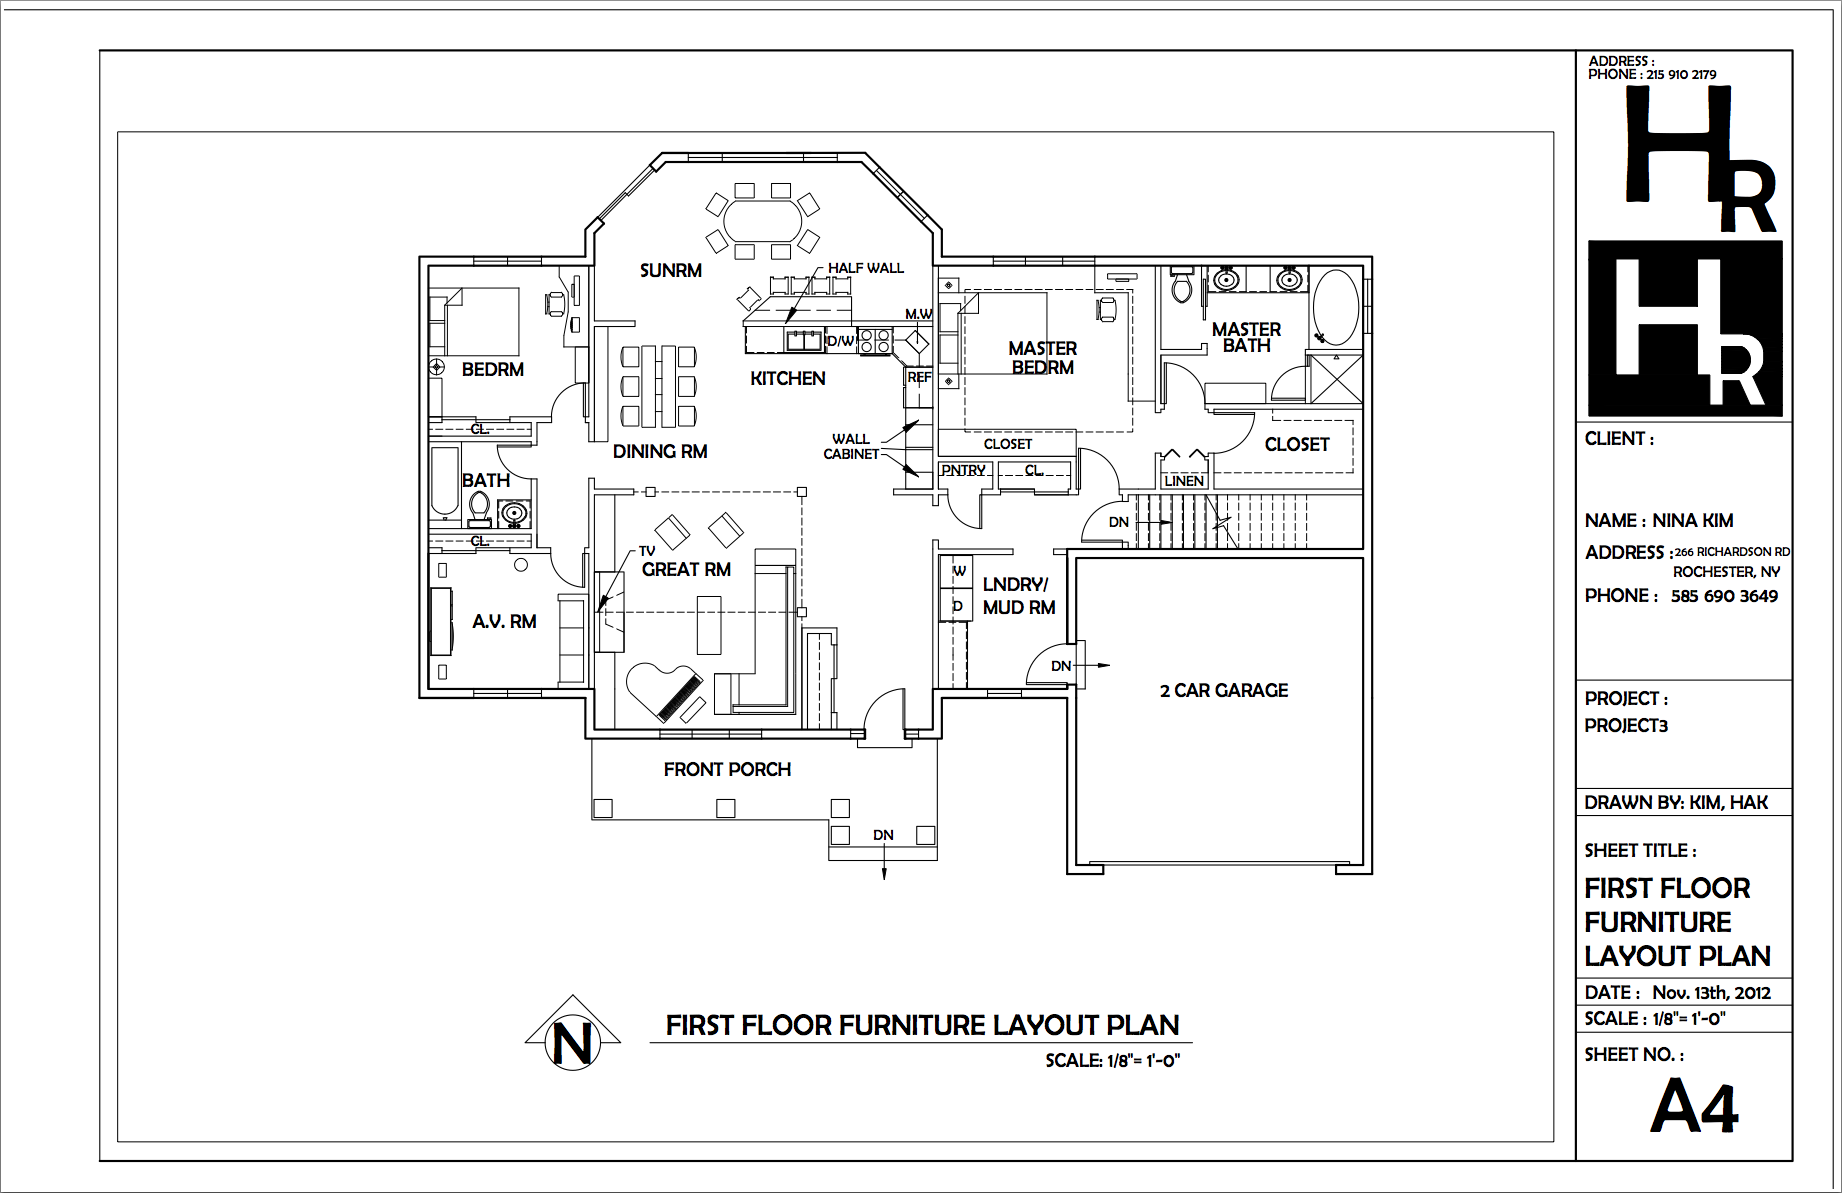 First Floor Furniture Layout Plan